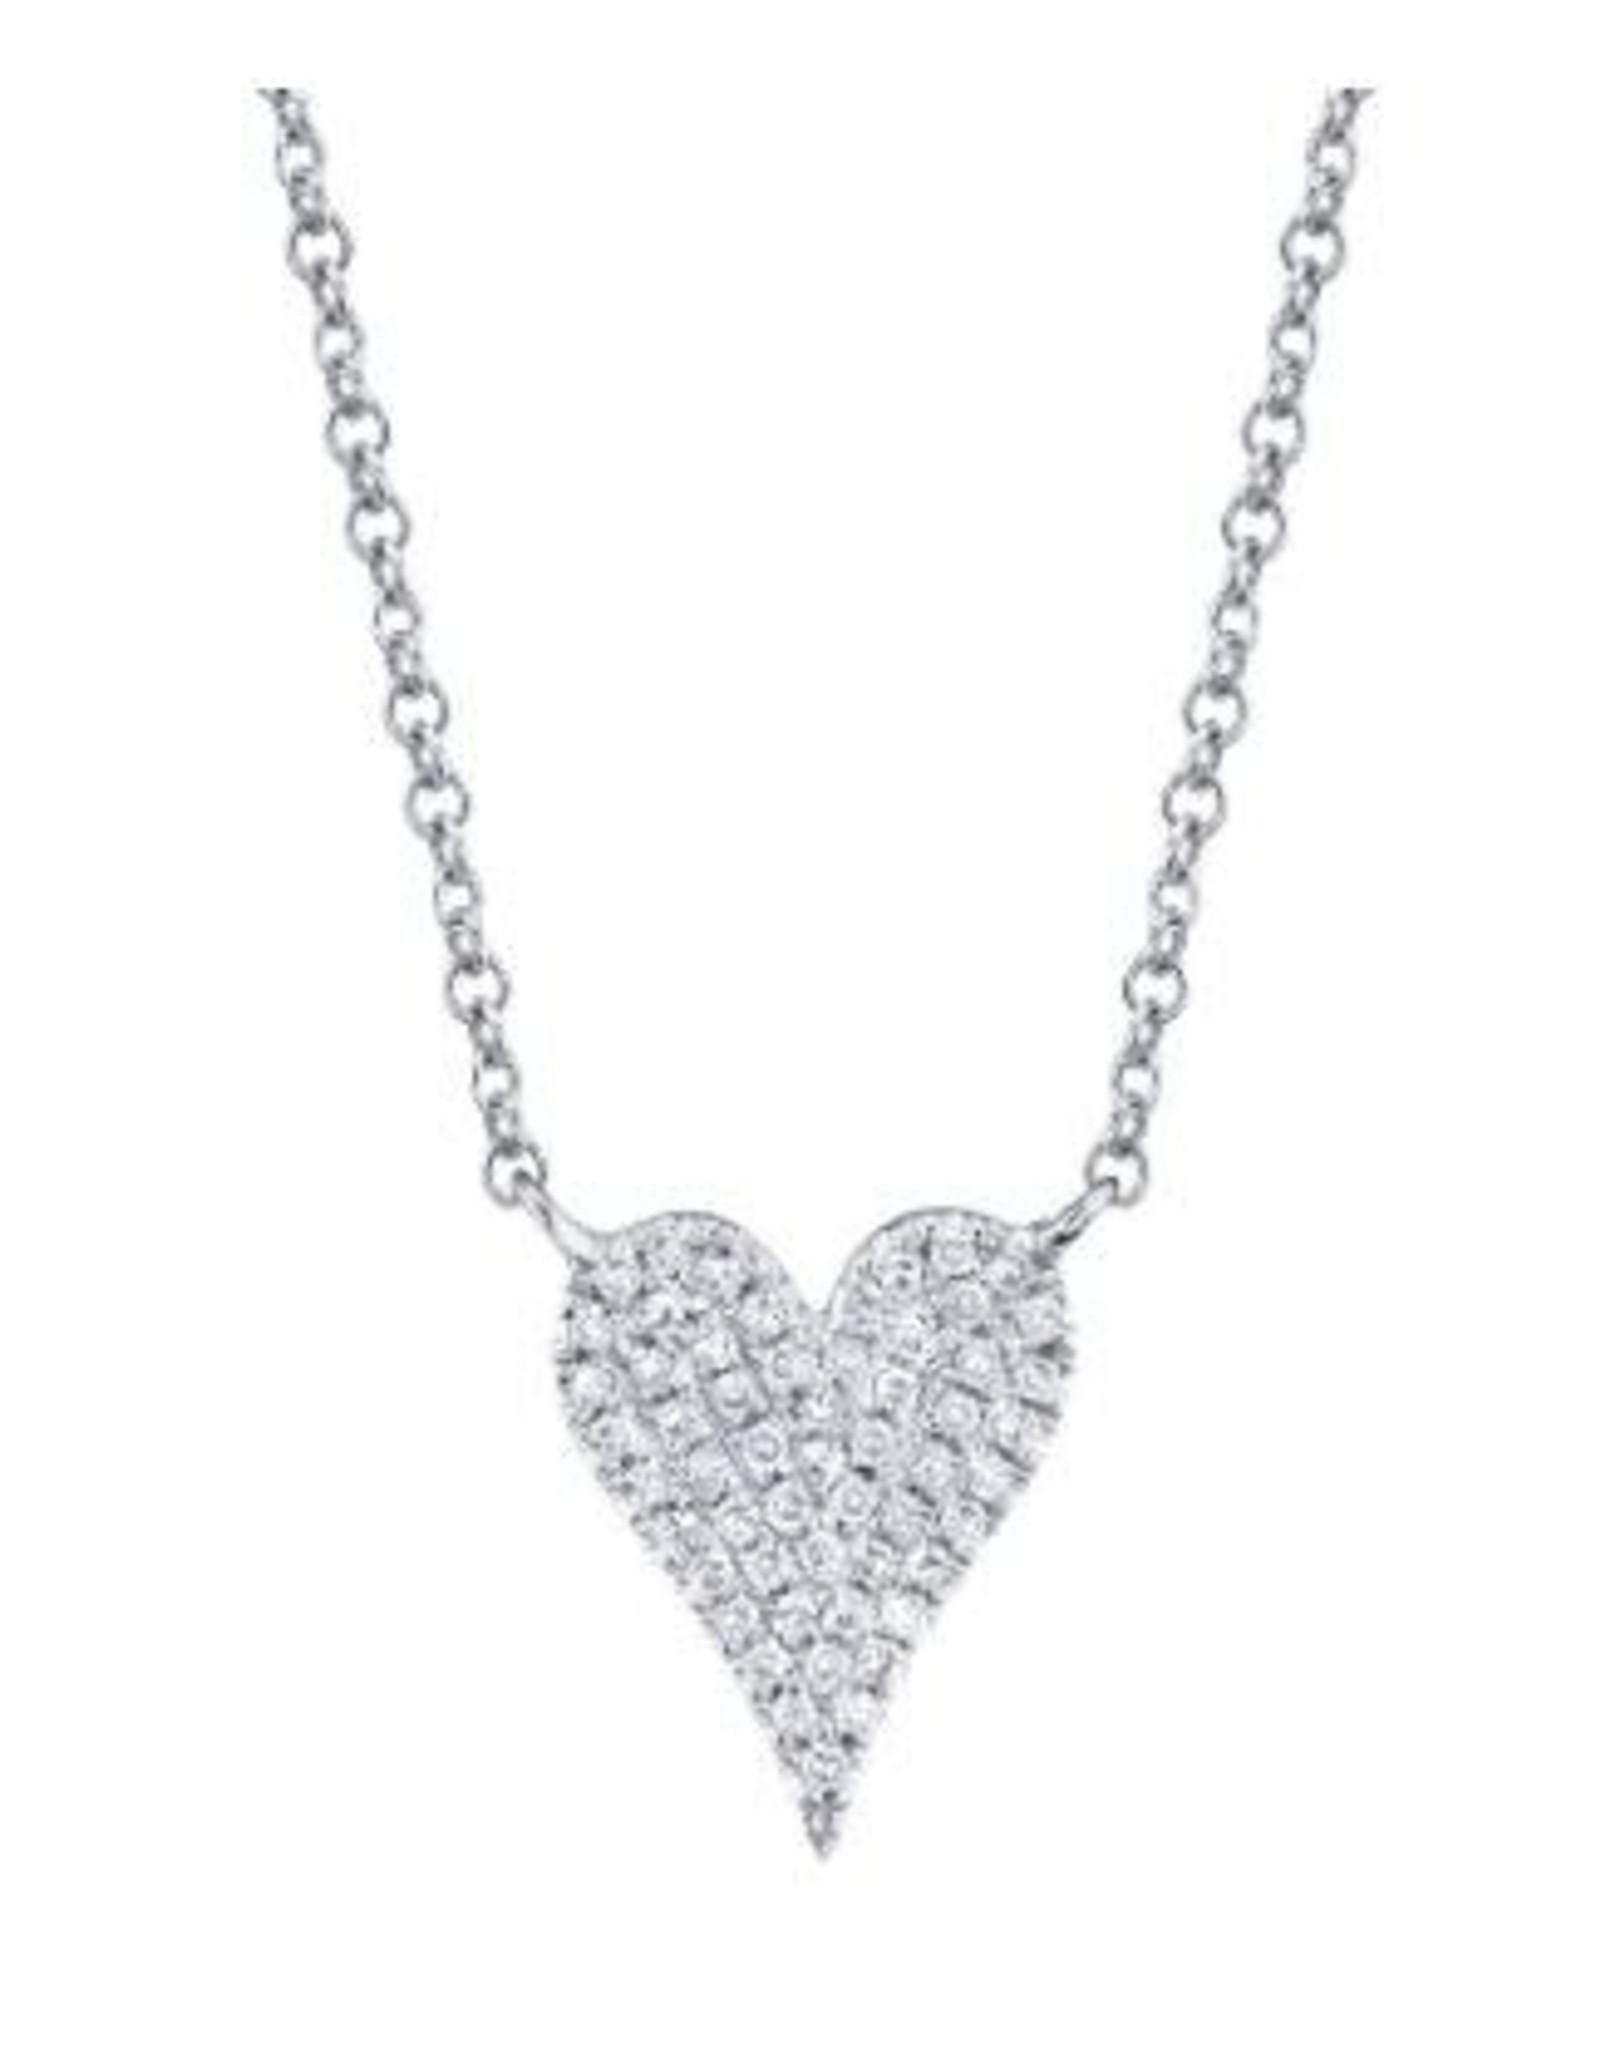 14K W/G Petite Diamond Heart, D: 0.11ct